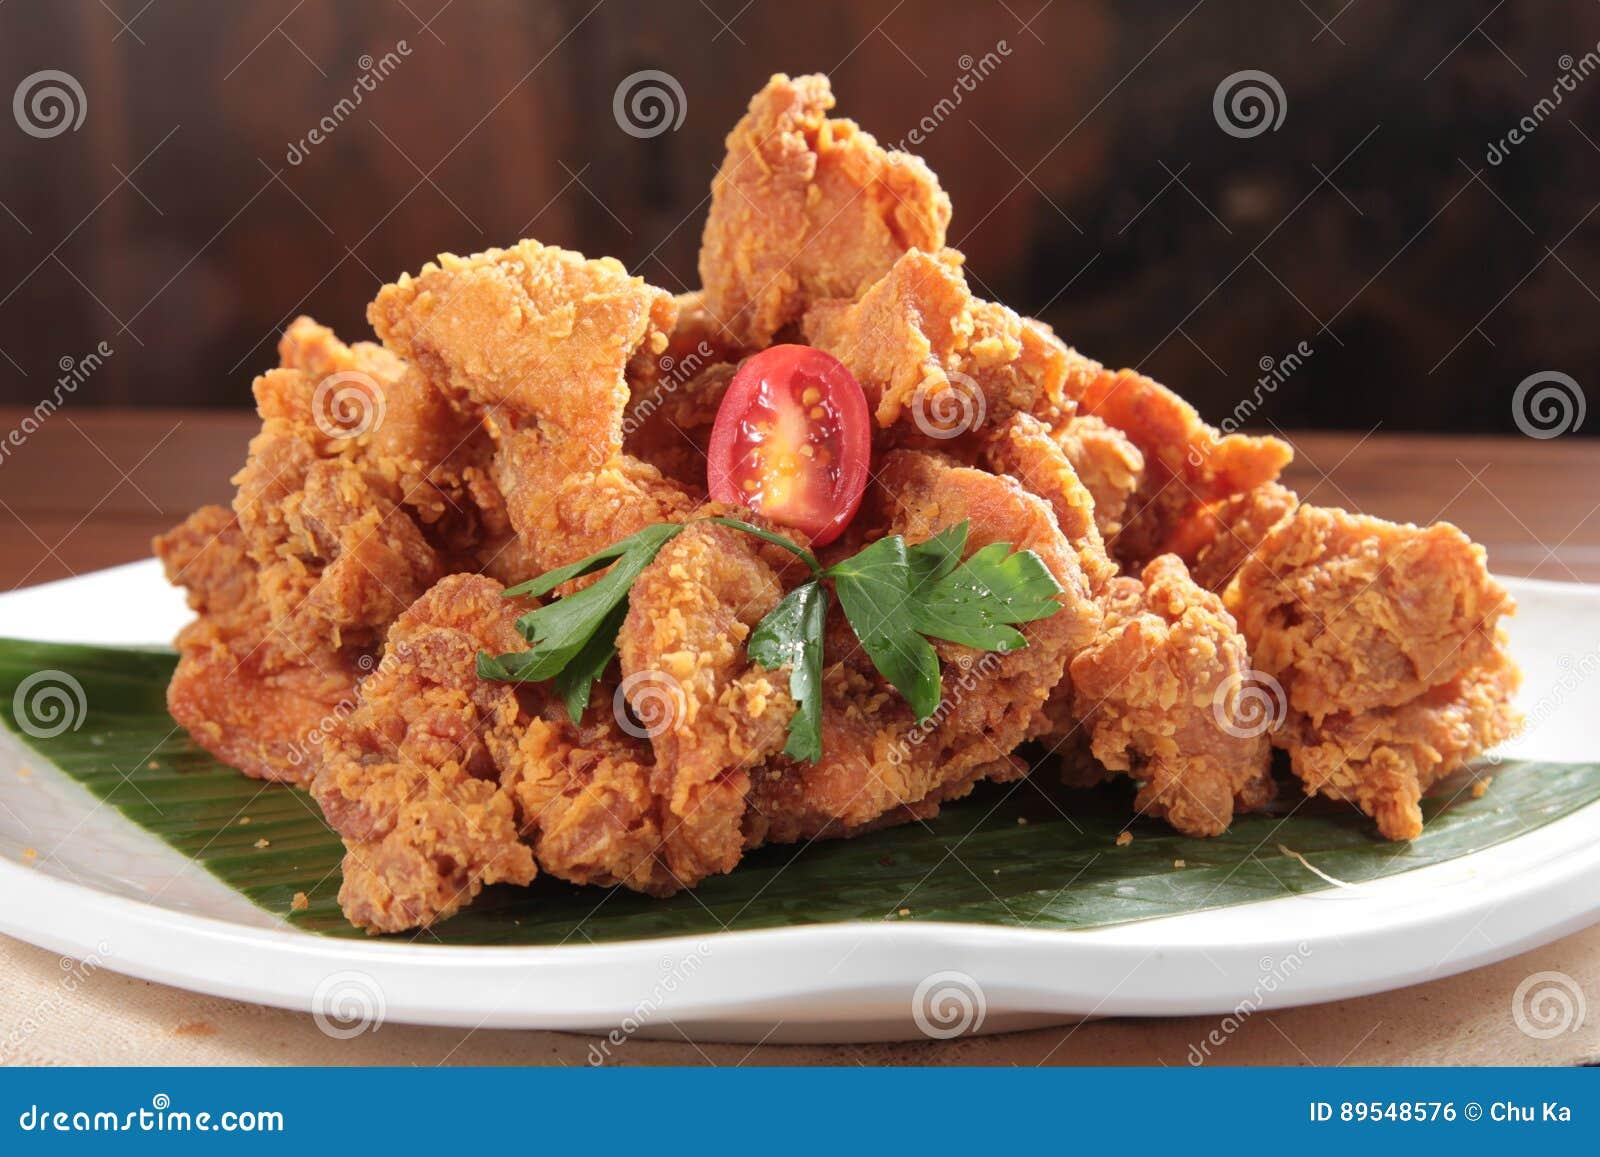 A tasty cuisine photo of deep fried chicken